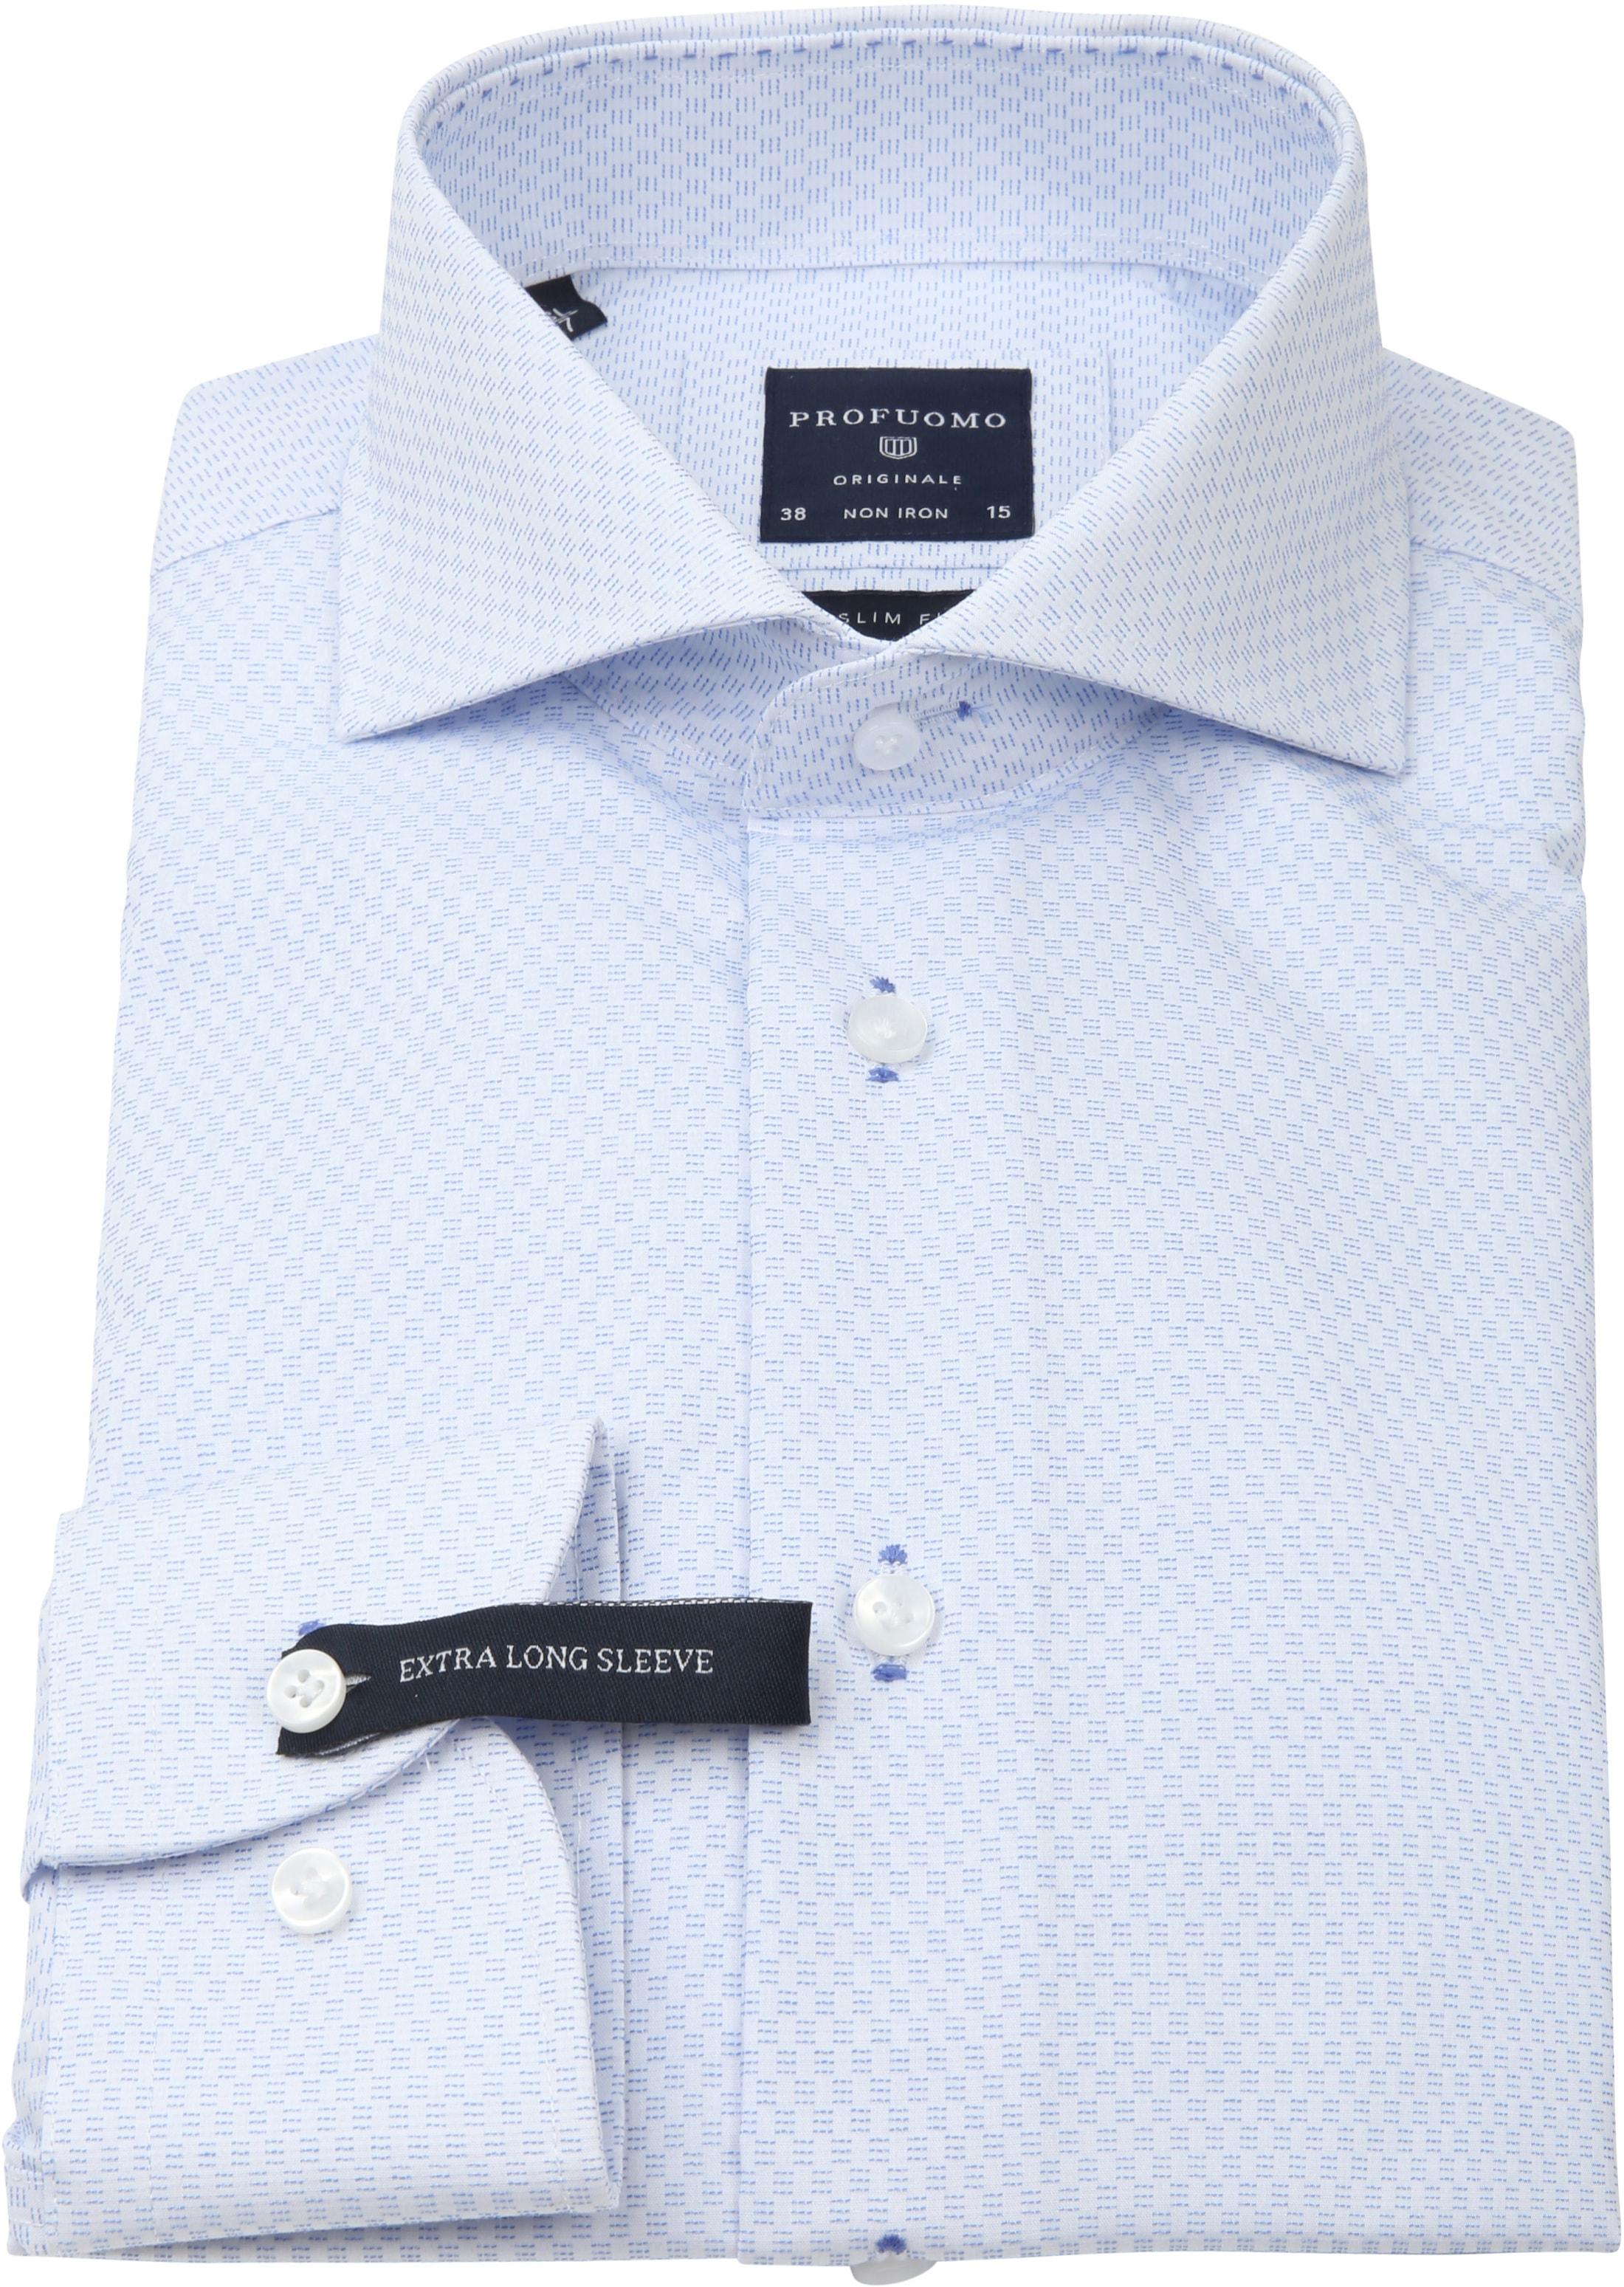 Profuomo Slim-Fit Overhemd Blauw SL7 foto 2